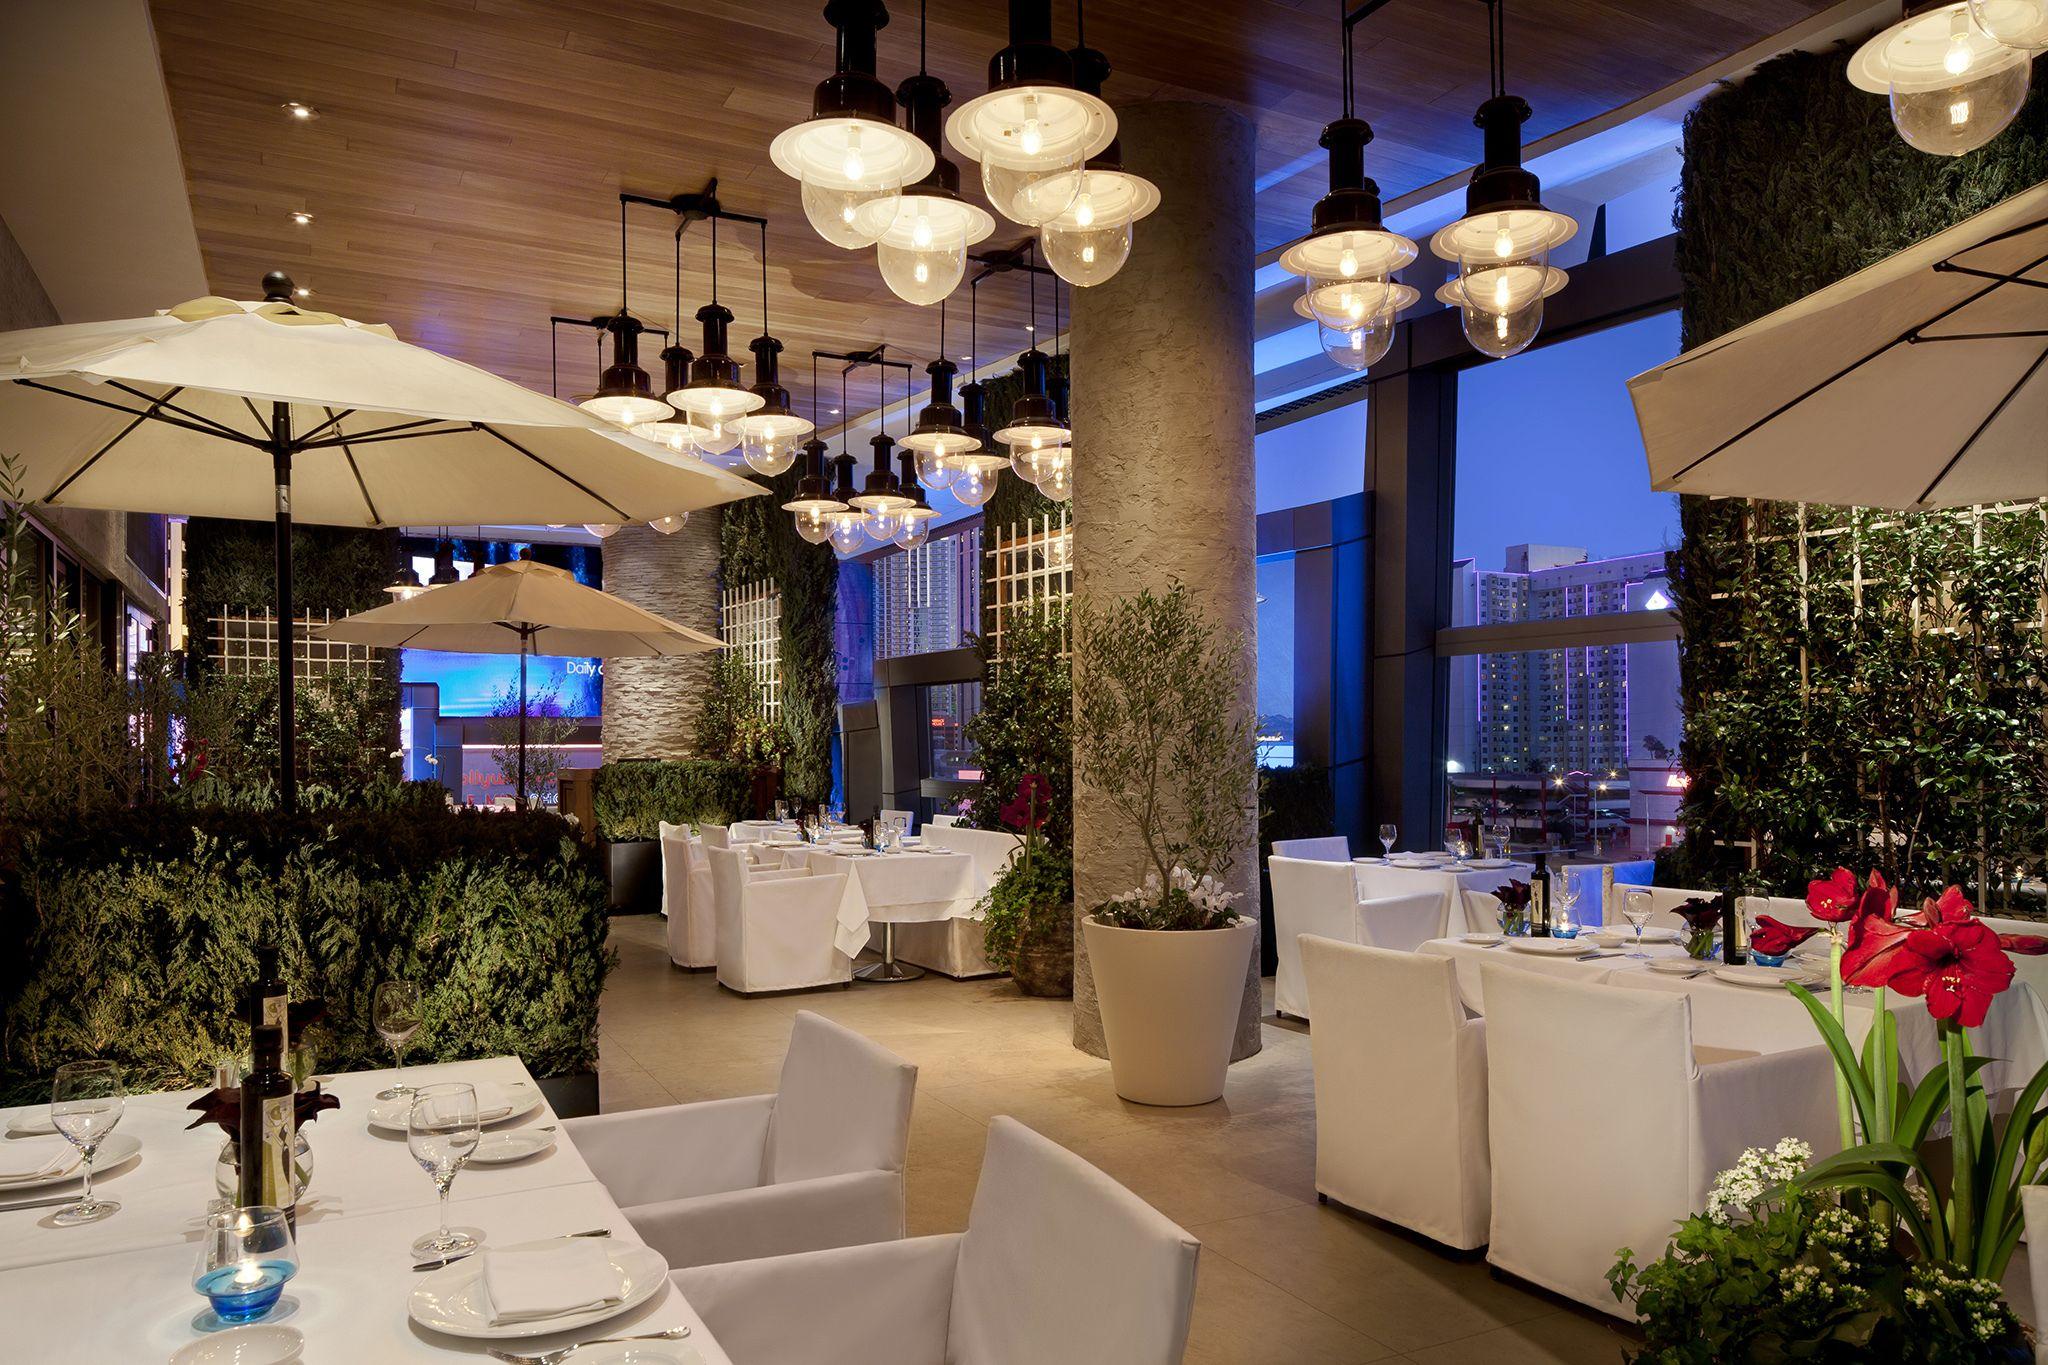 Side Z. reccomend Best restaurants on the las vegas strip